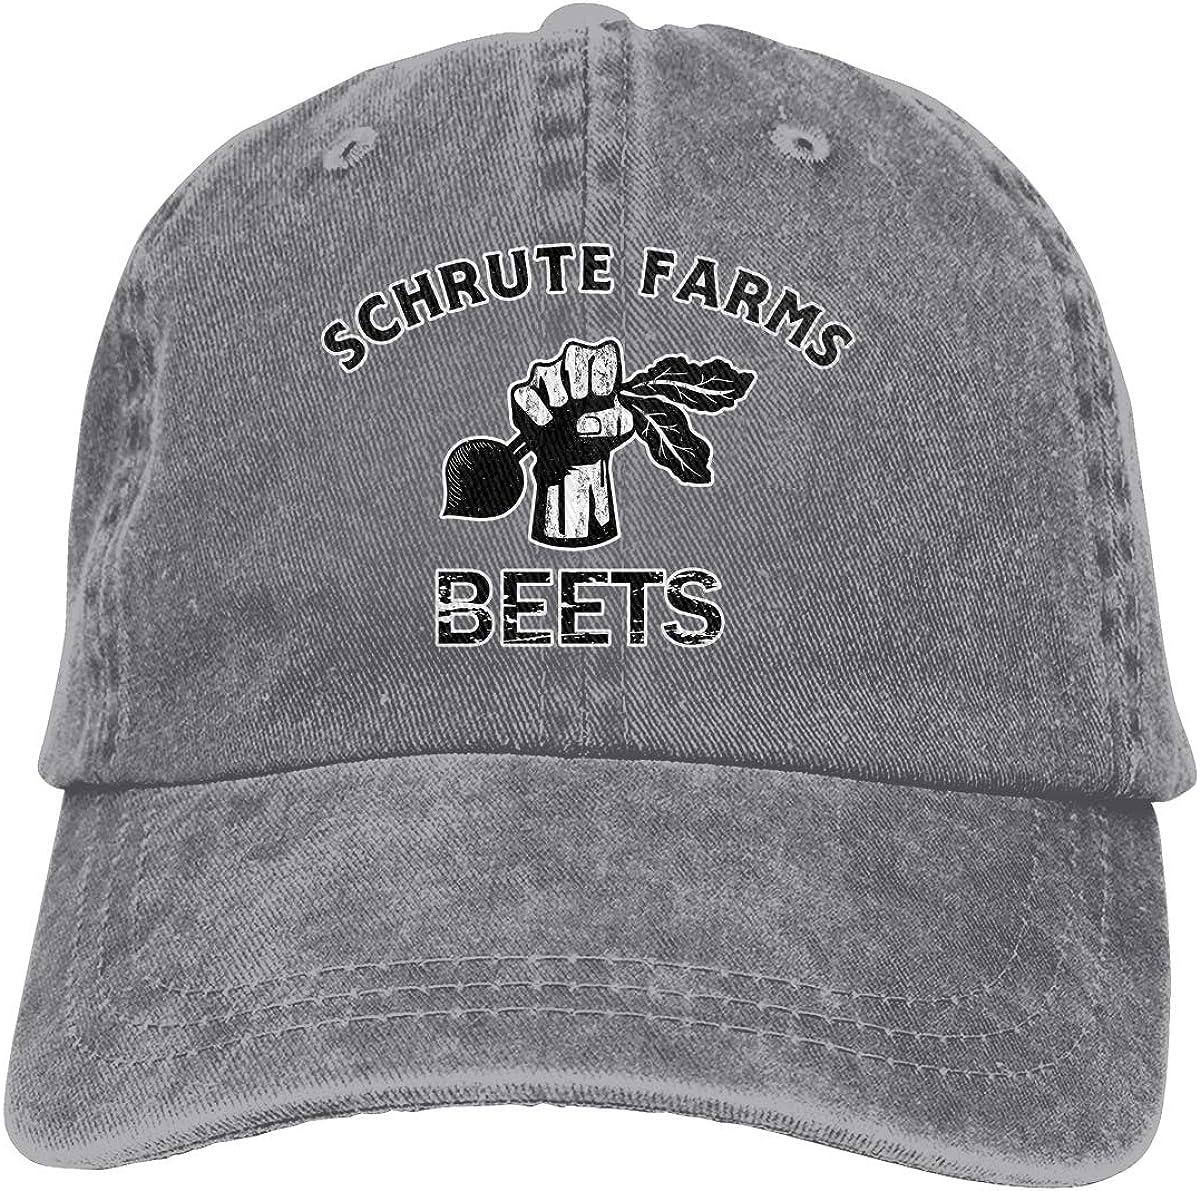 Unisex Schrute Farms Beets Vintage Washed Dad Hat Popular Adjustable Baseball Cap